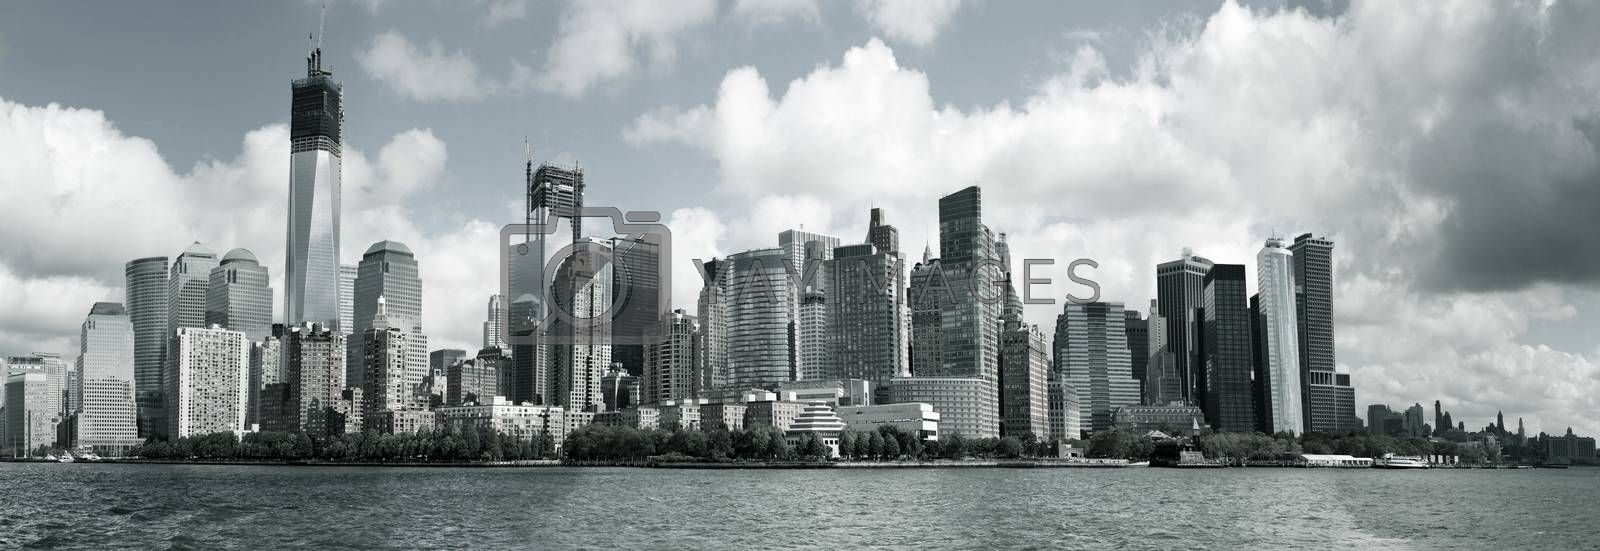 New York City - Manhattan by friday